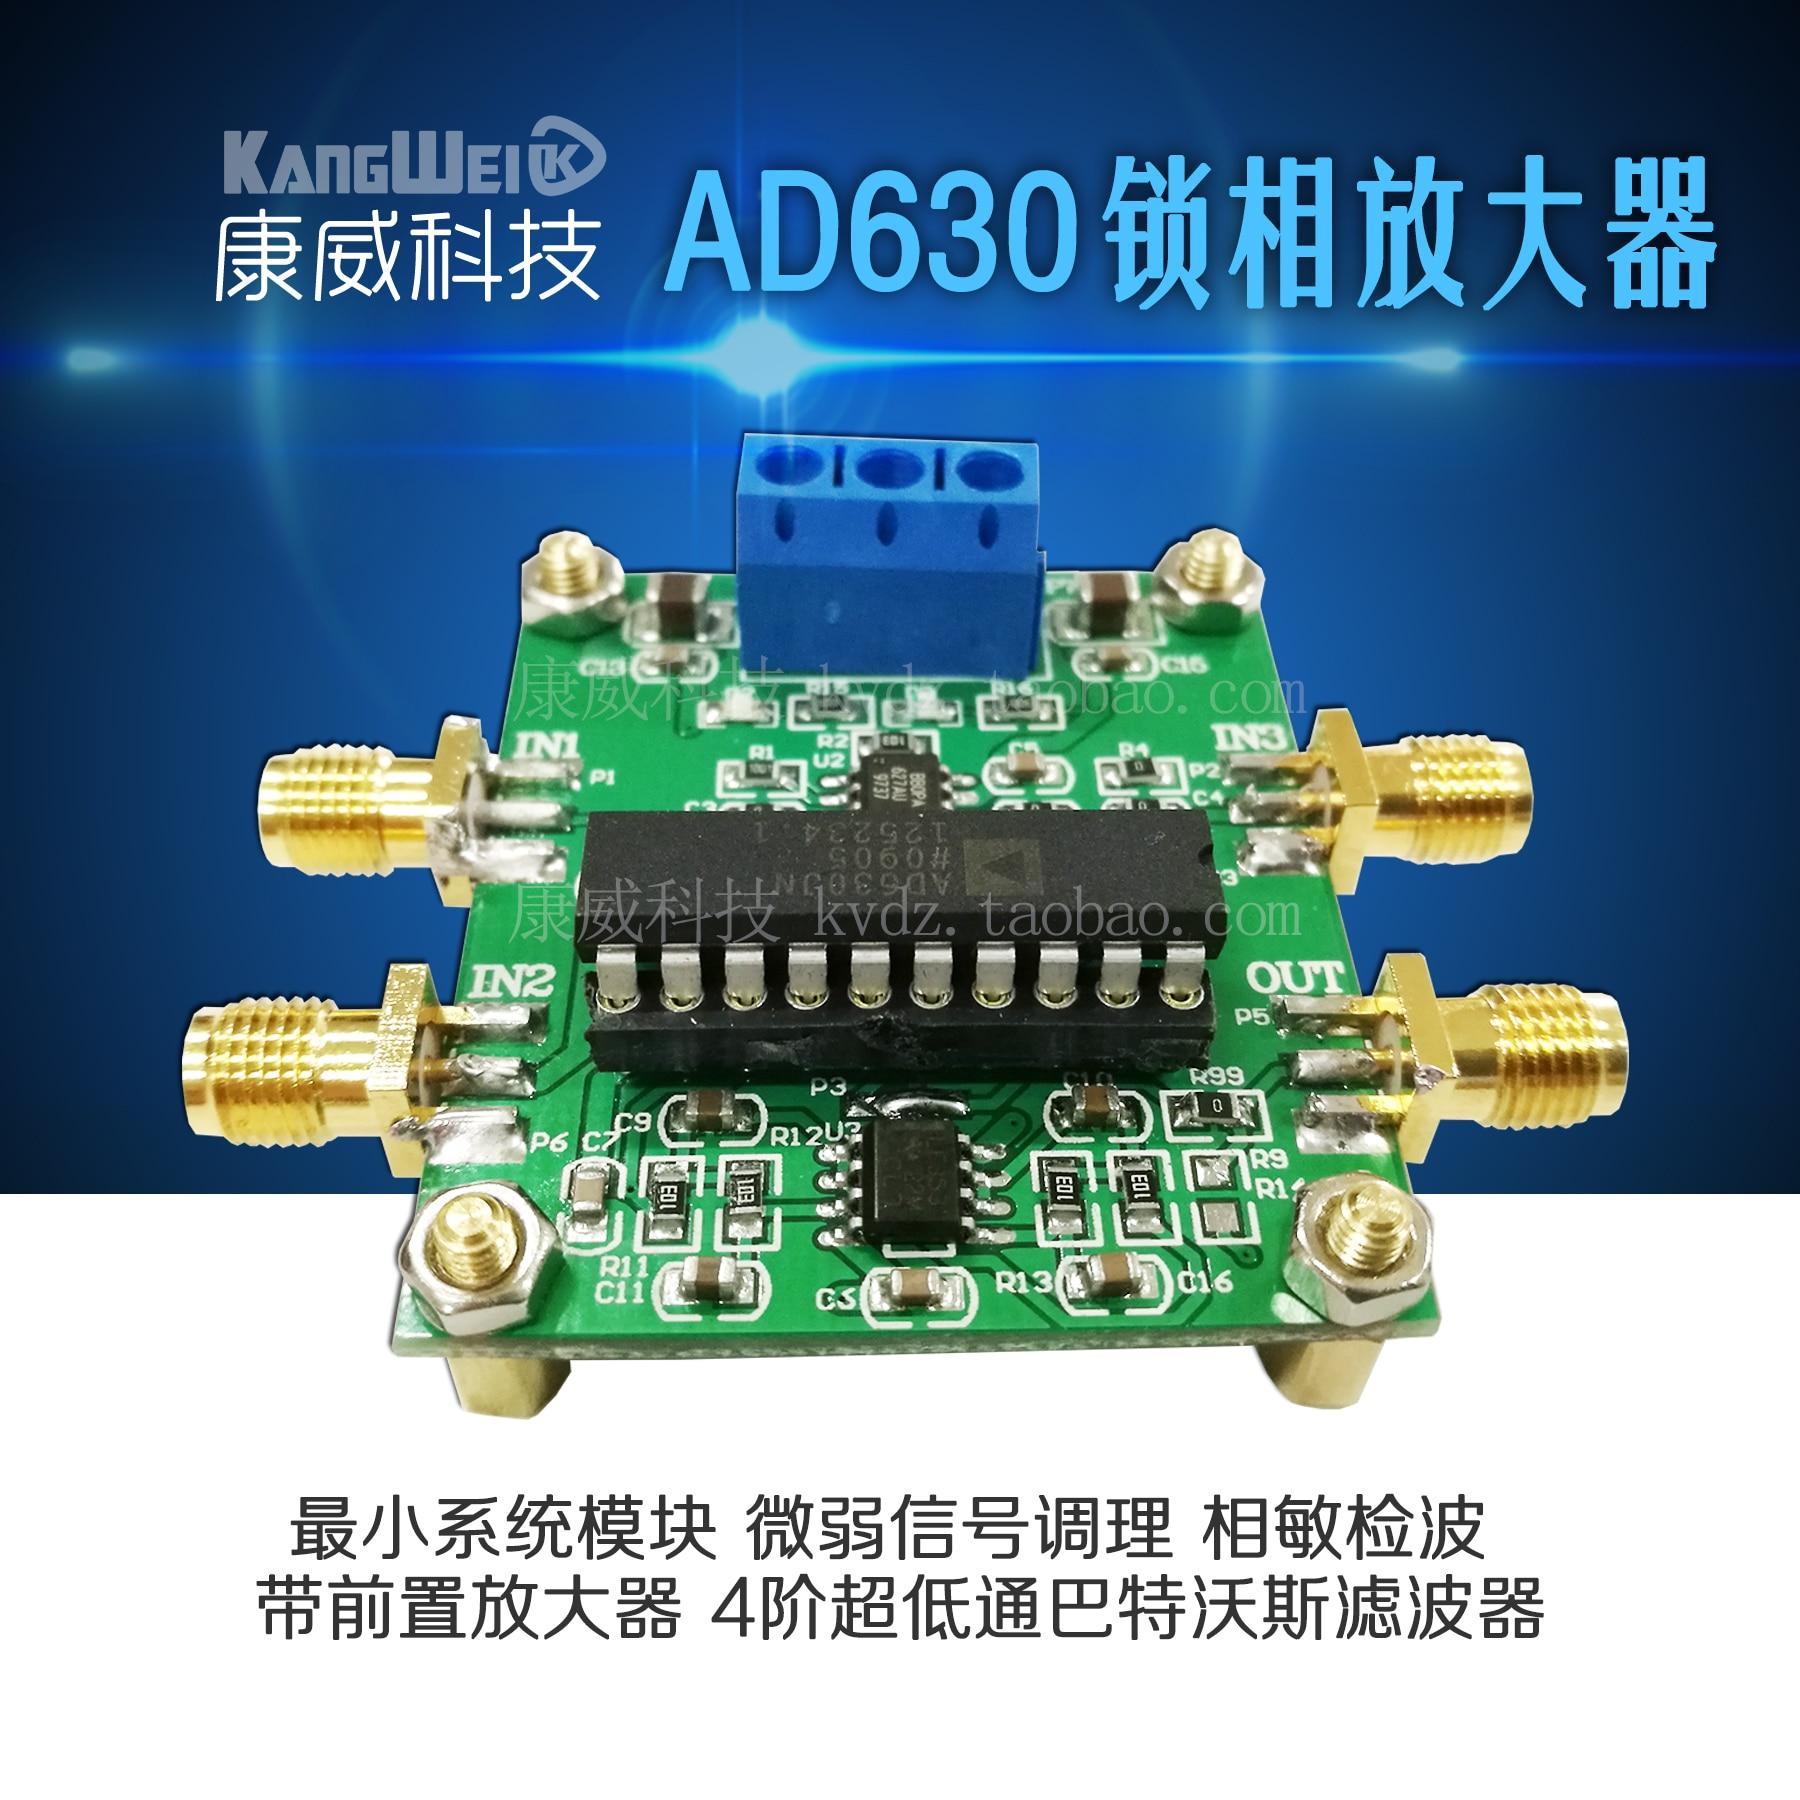 Lock in Amplifier LIA AD630 Module Minimum System Phase Sensitive Detection